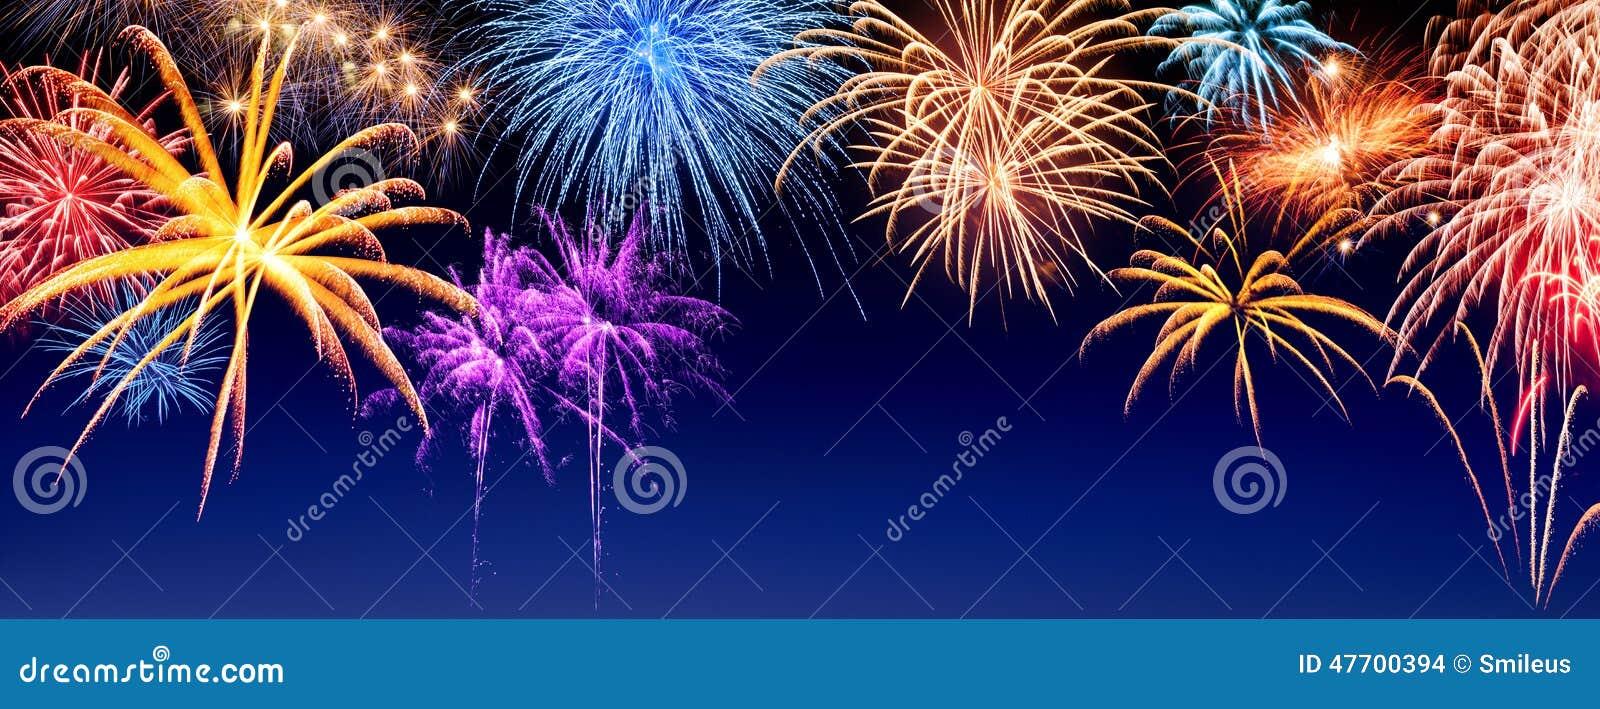 Fireworks display panorama